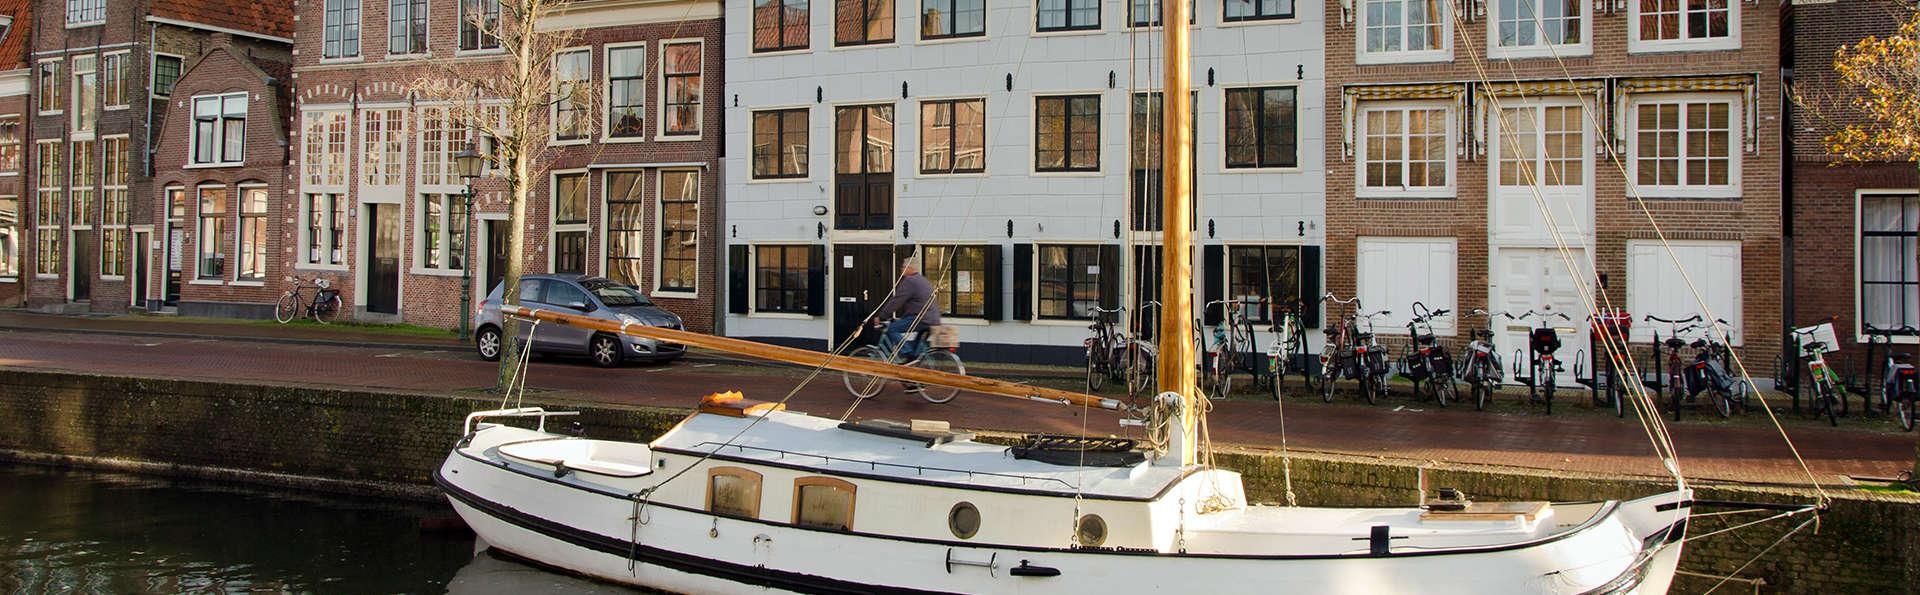 Van der Valk Hotel Hoorn - Edit_Hoorn.jpg